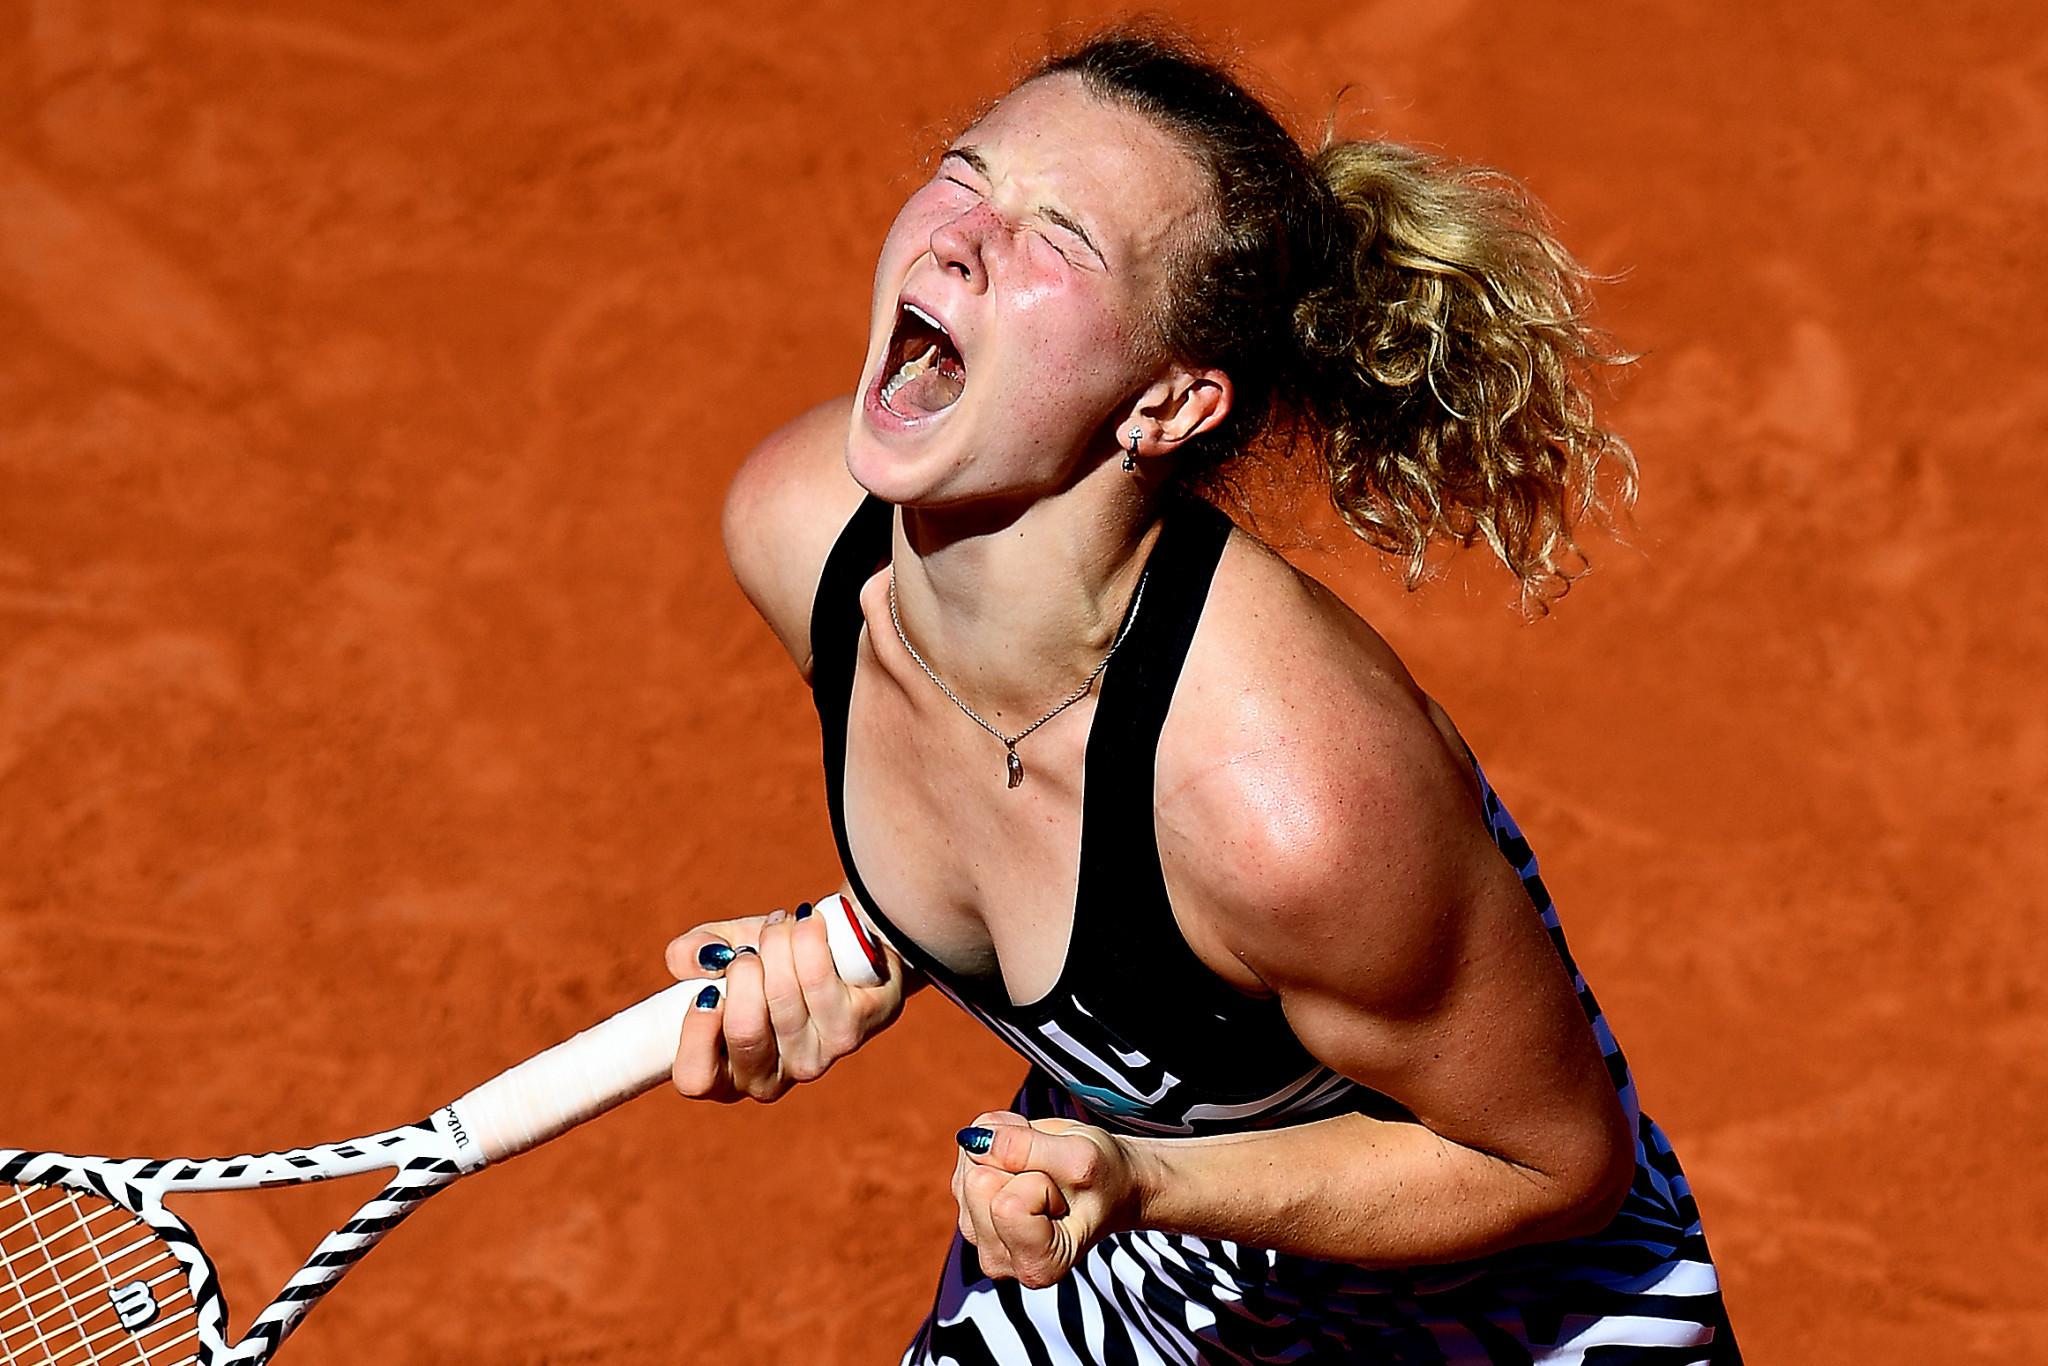 Siniaková overpowers French Open top seed Osaka